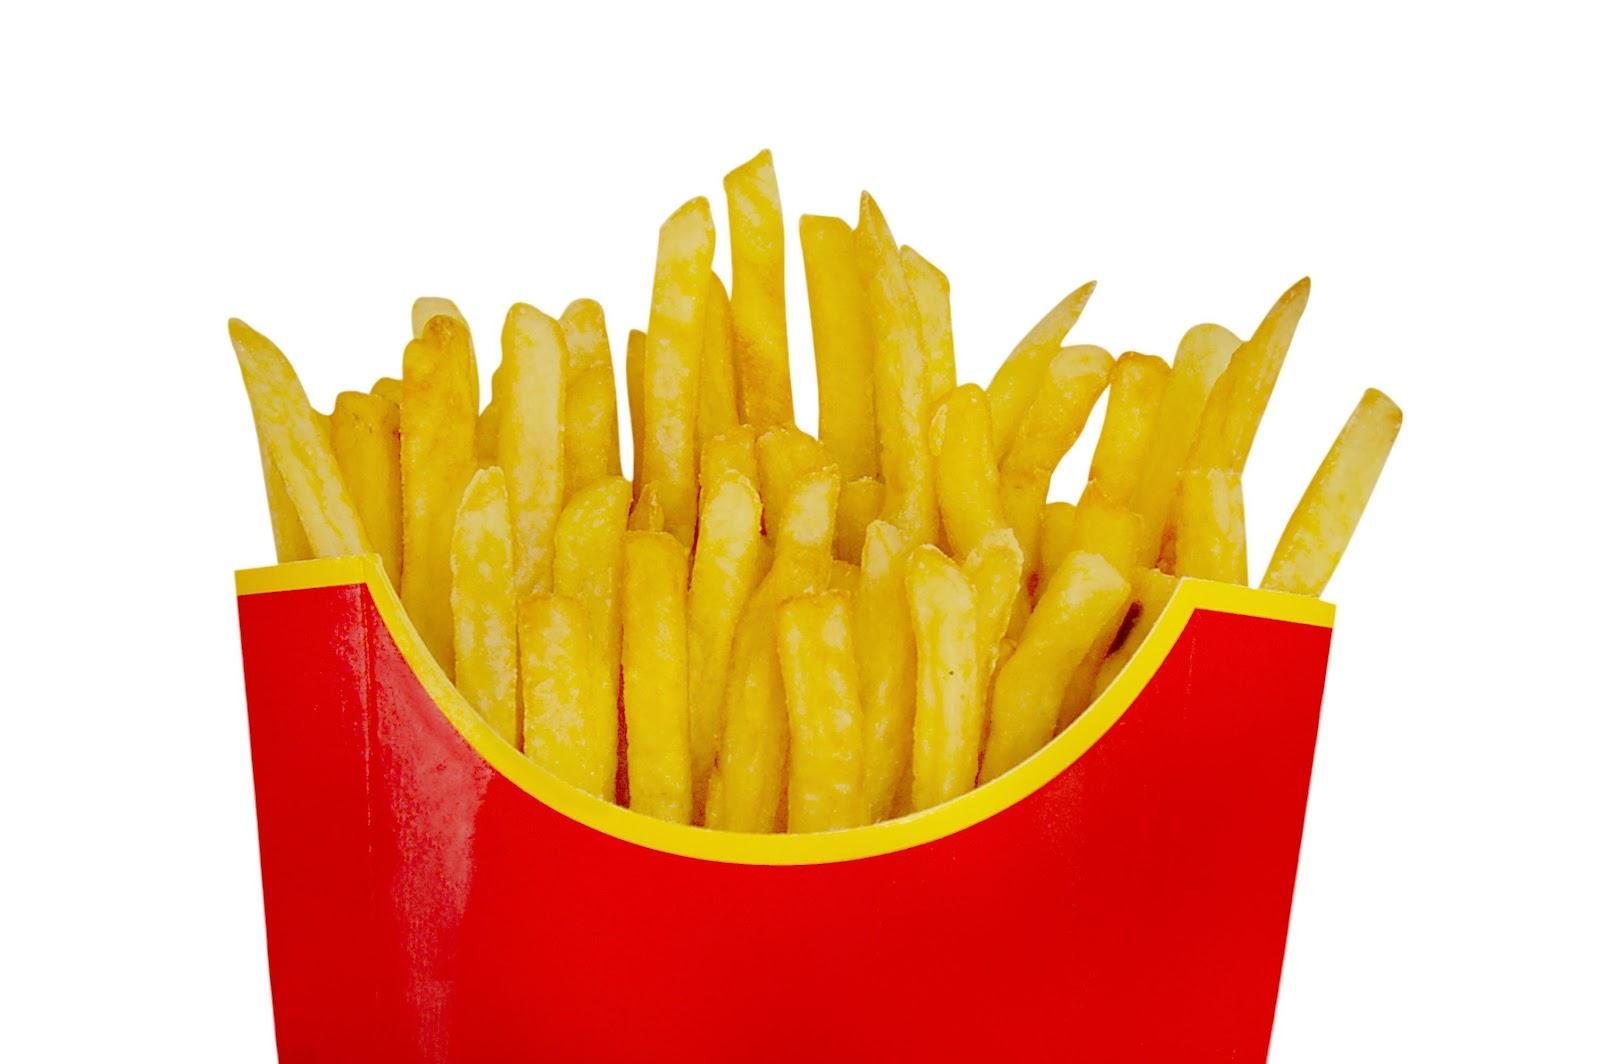 Copycat McDonald's French Fries Recipe by David Kaplan